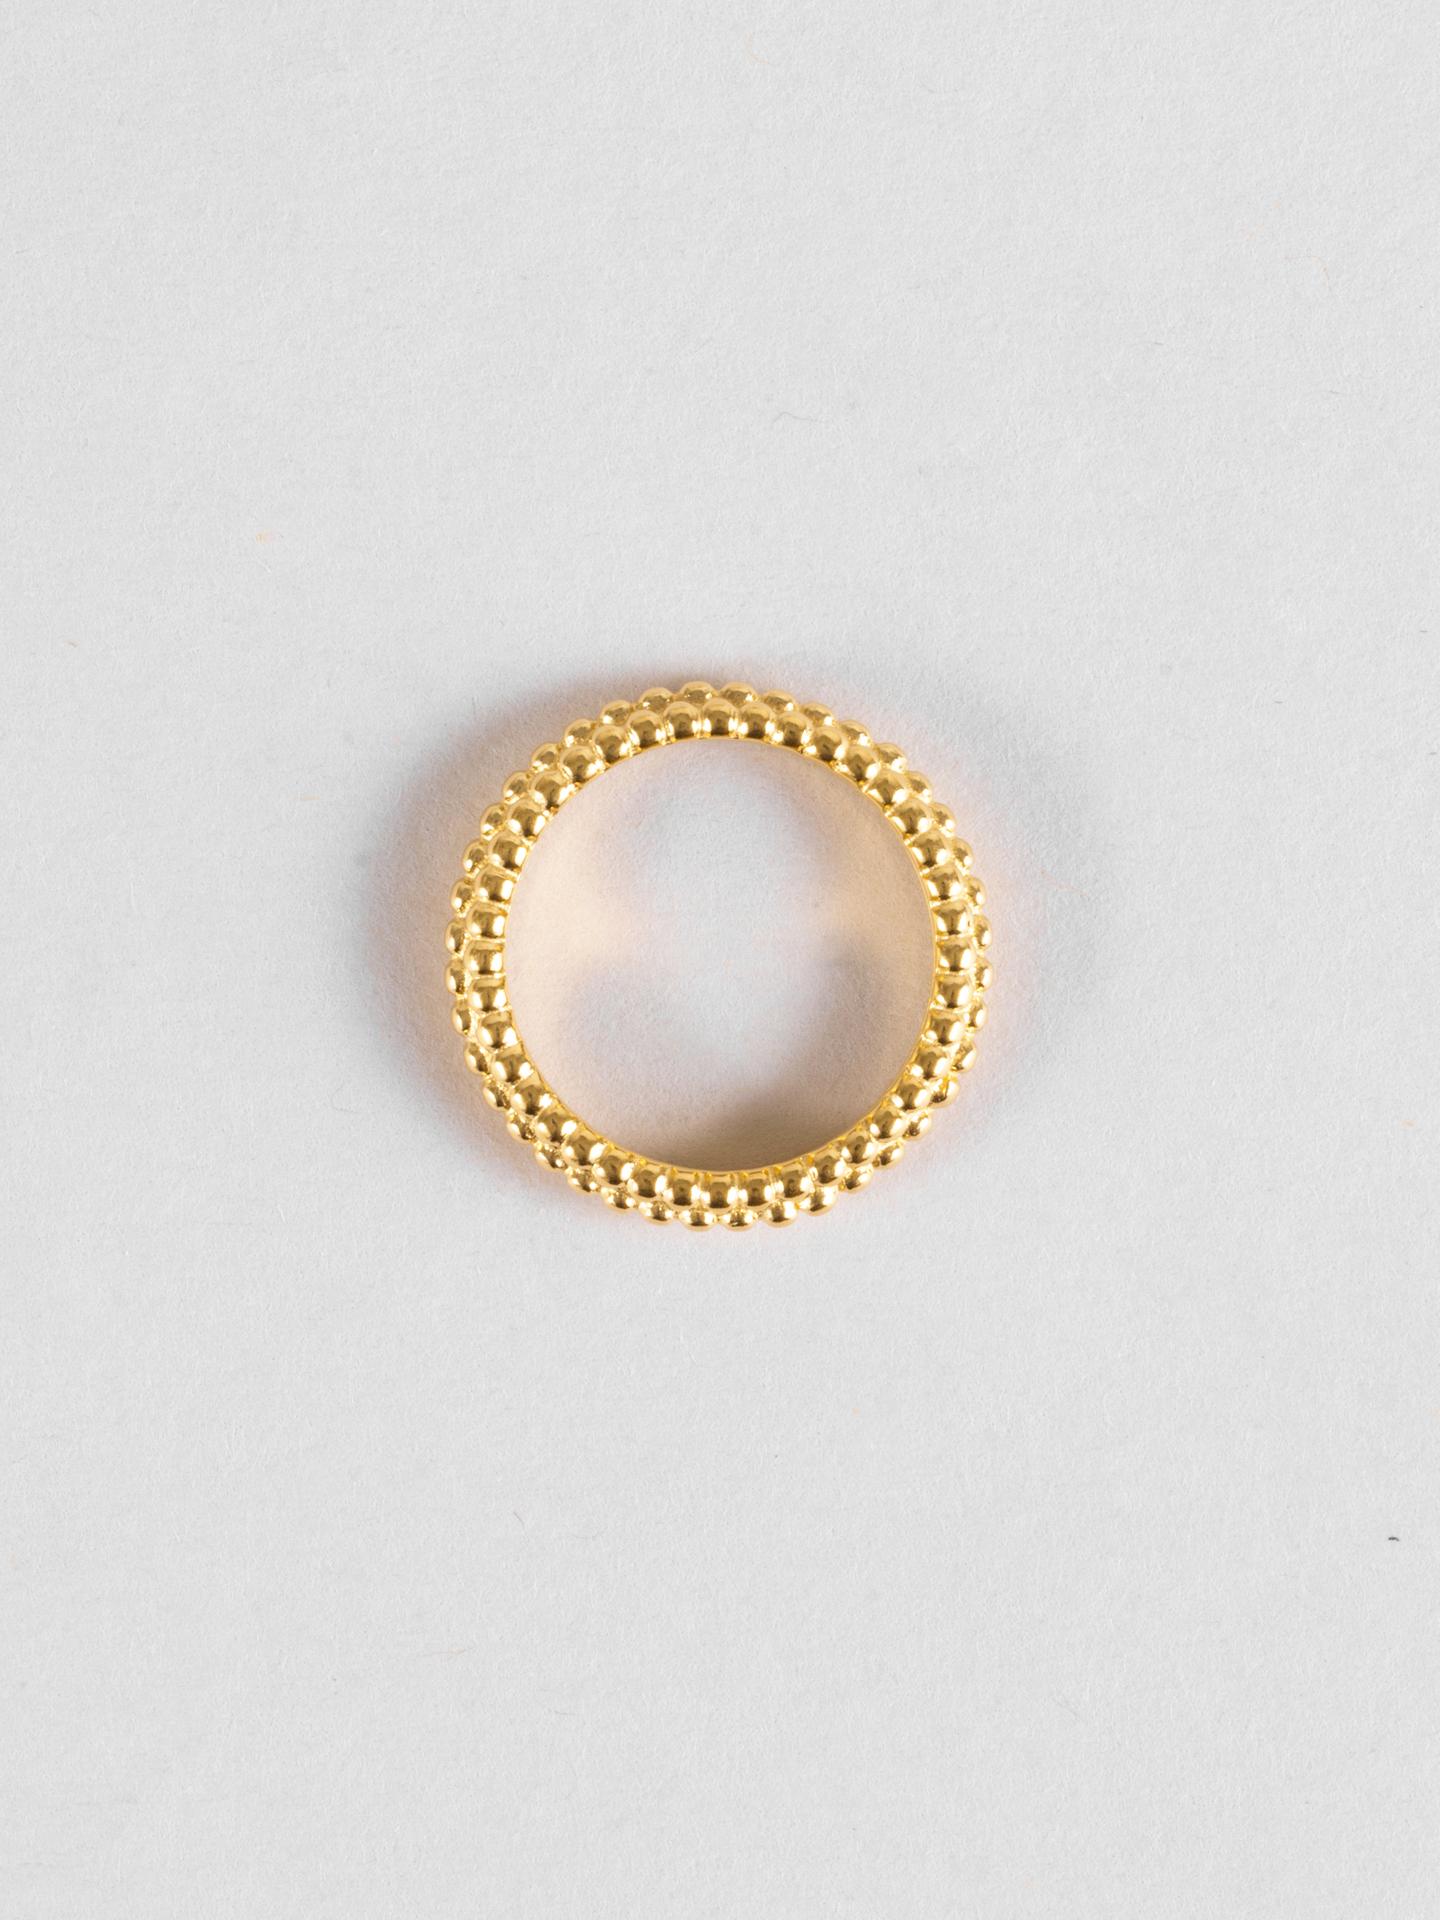 Baby Honey Comb Ring